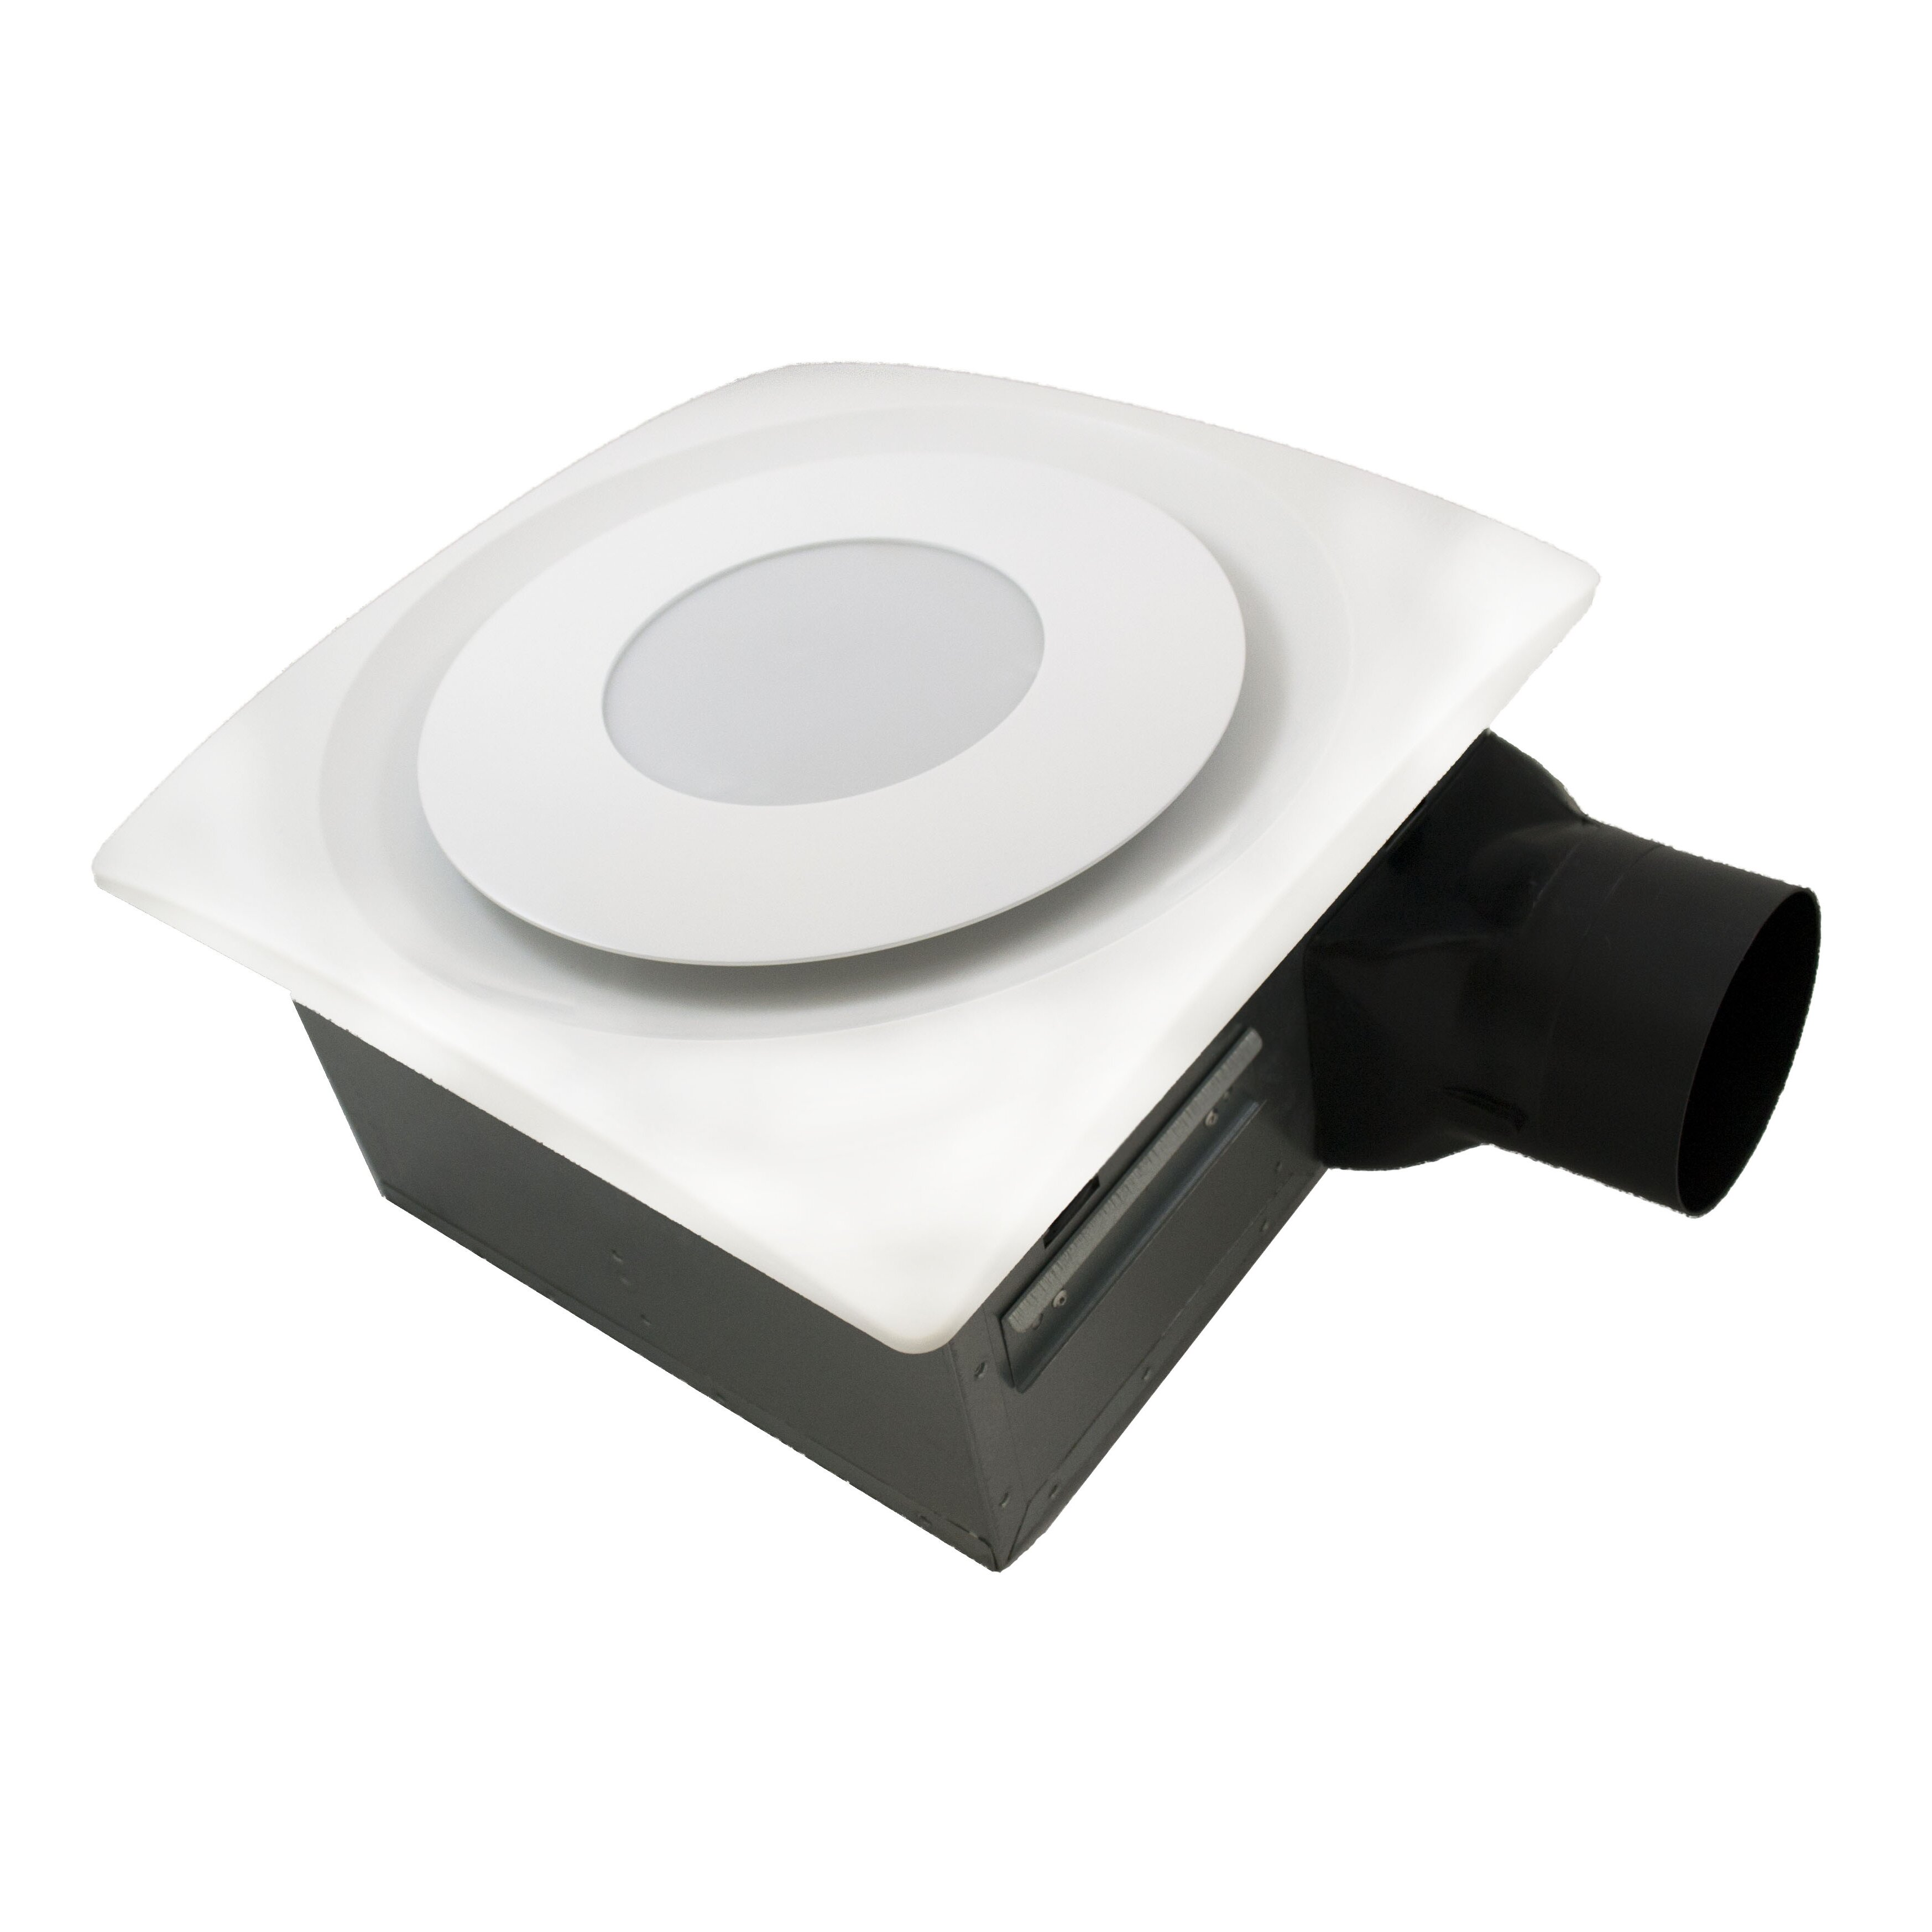 Aero Pure Slimfit 90 Cfm Bathroom Fan With Light Reviews